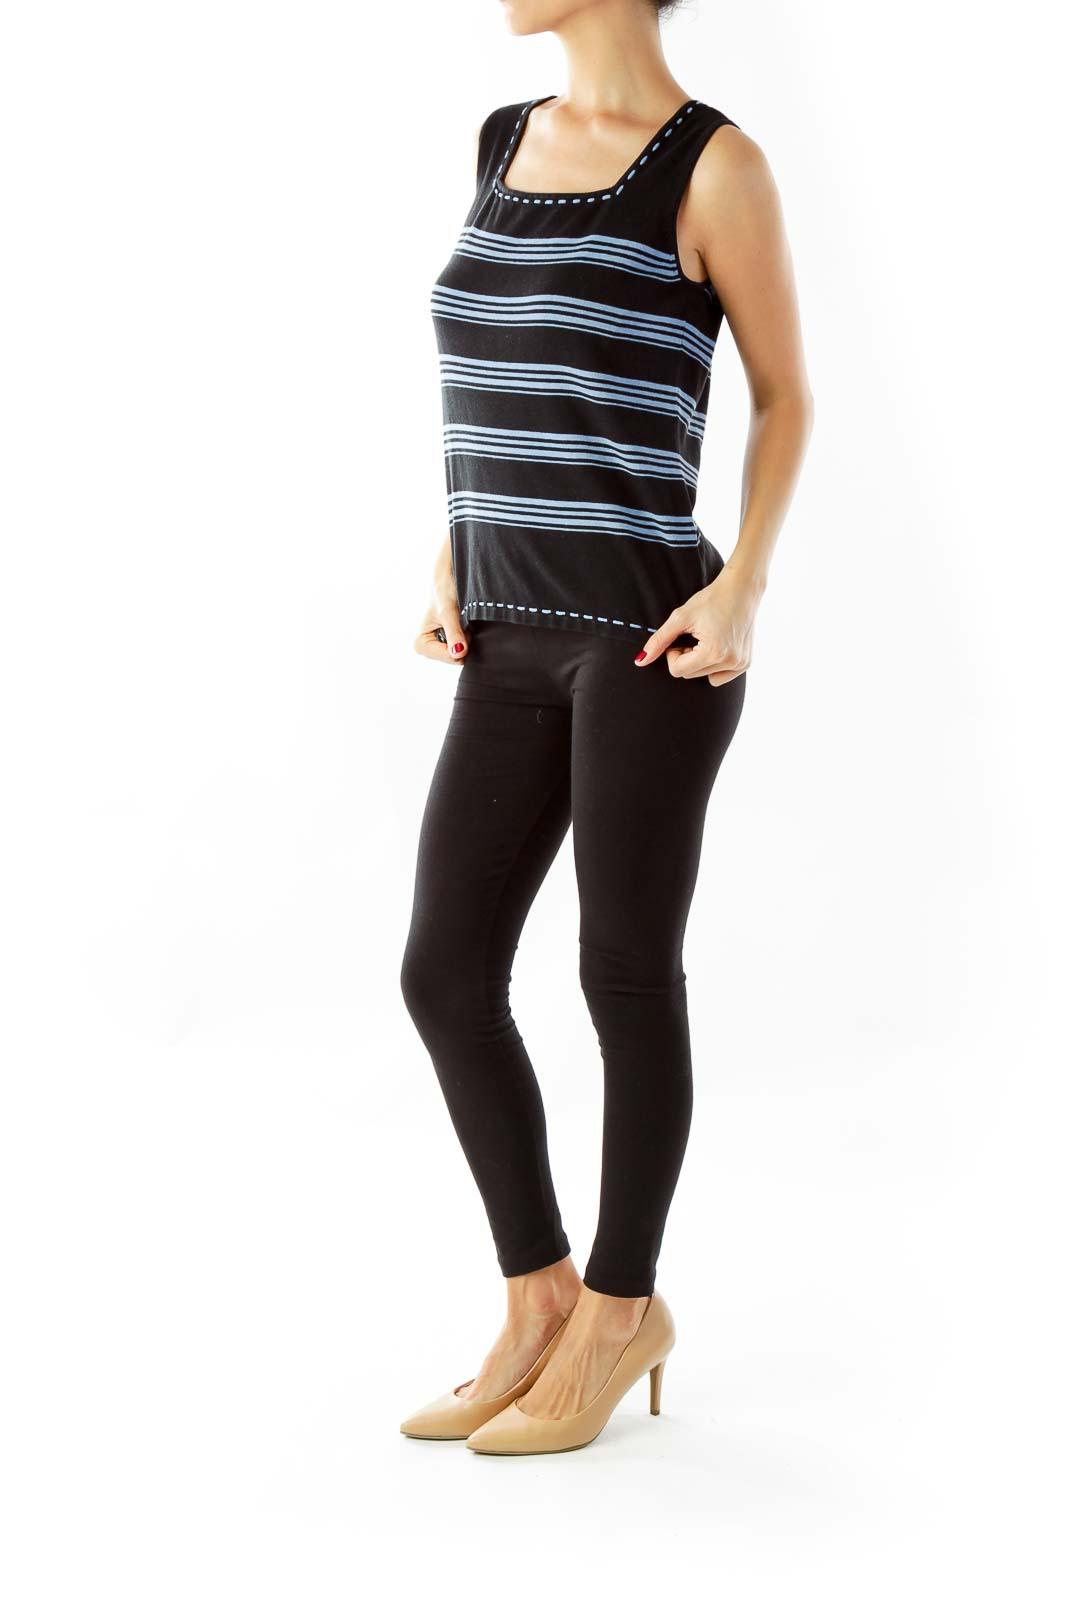 Black & Blue Striped Sleeveless Top